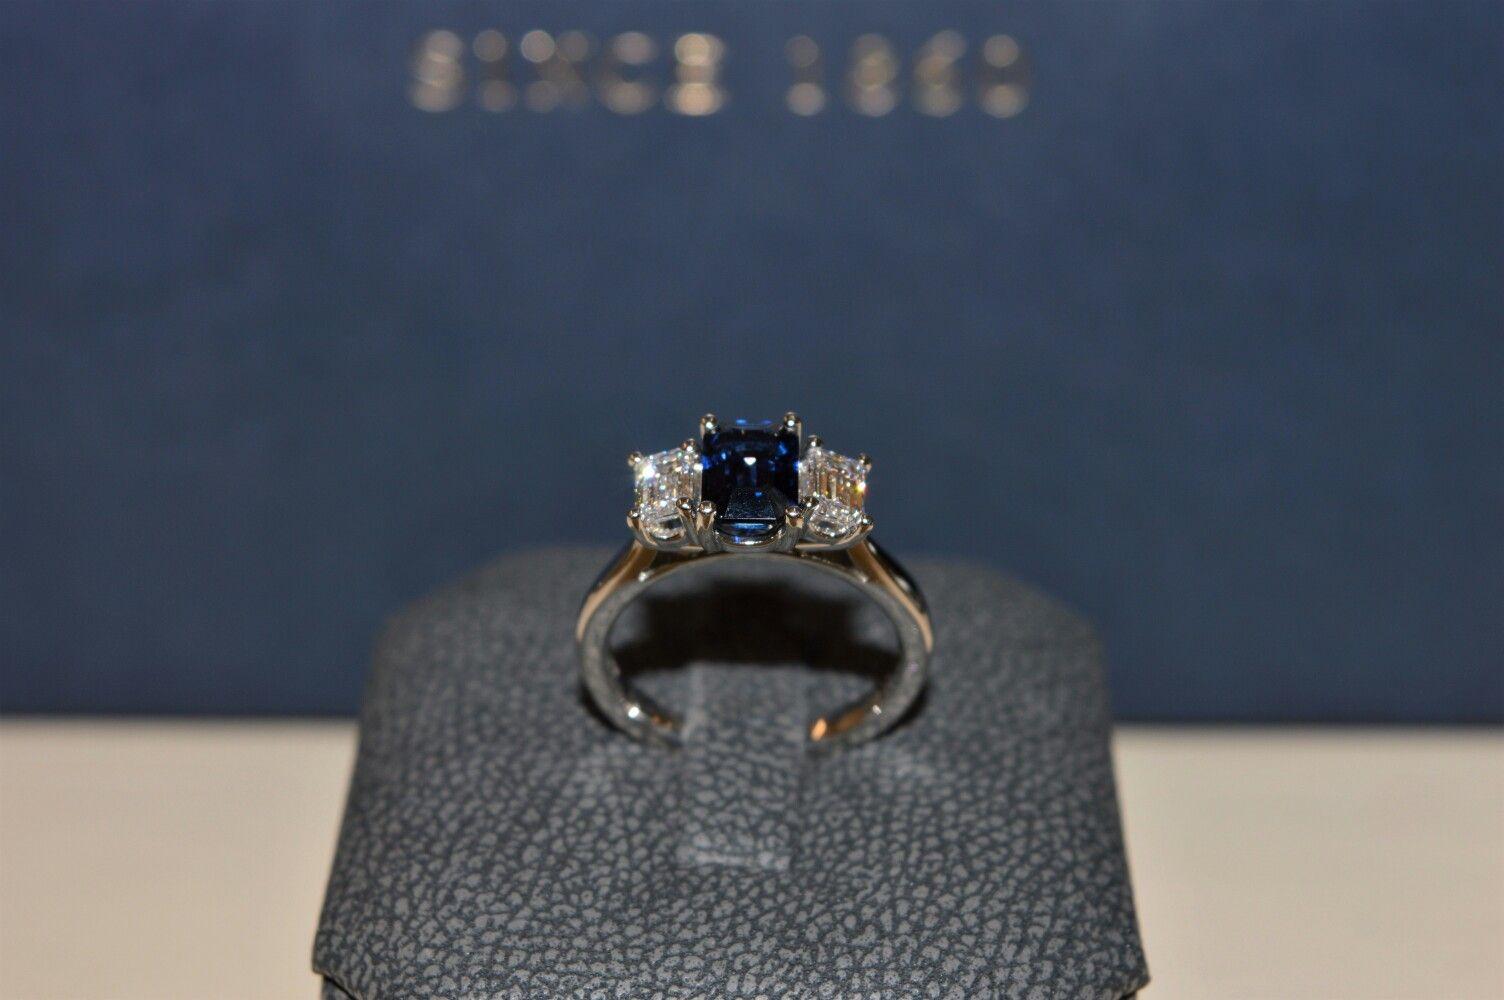 Sapphire and emerald cut diamond ring www.hancocksjewellers.co.uk